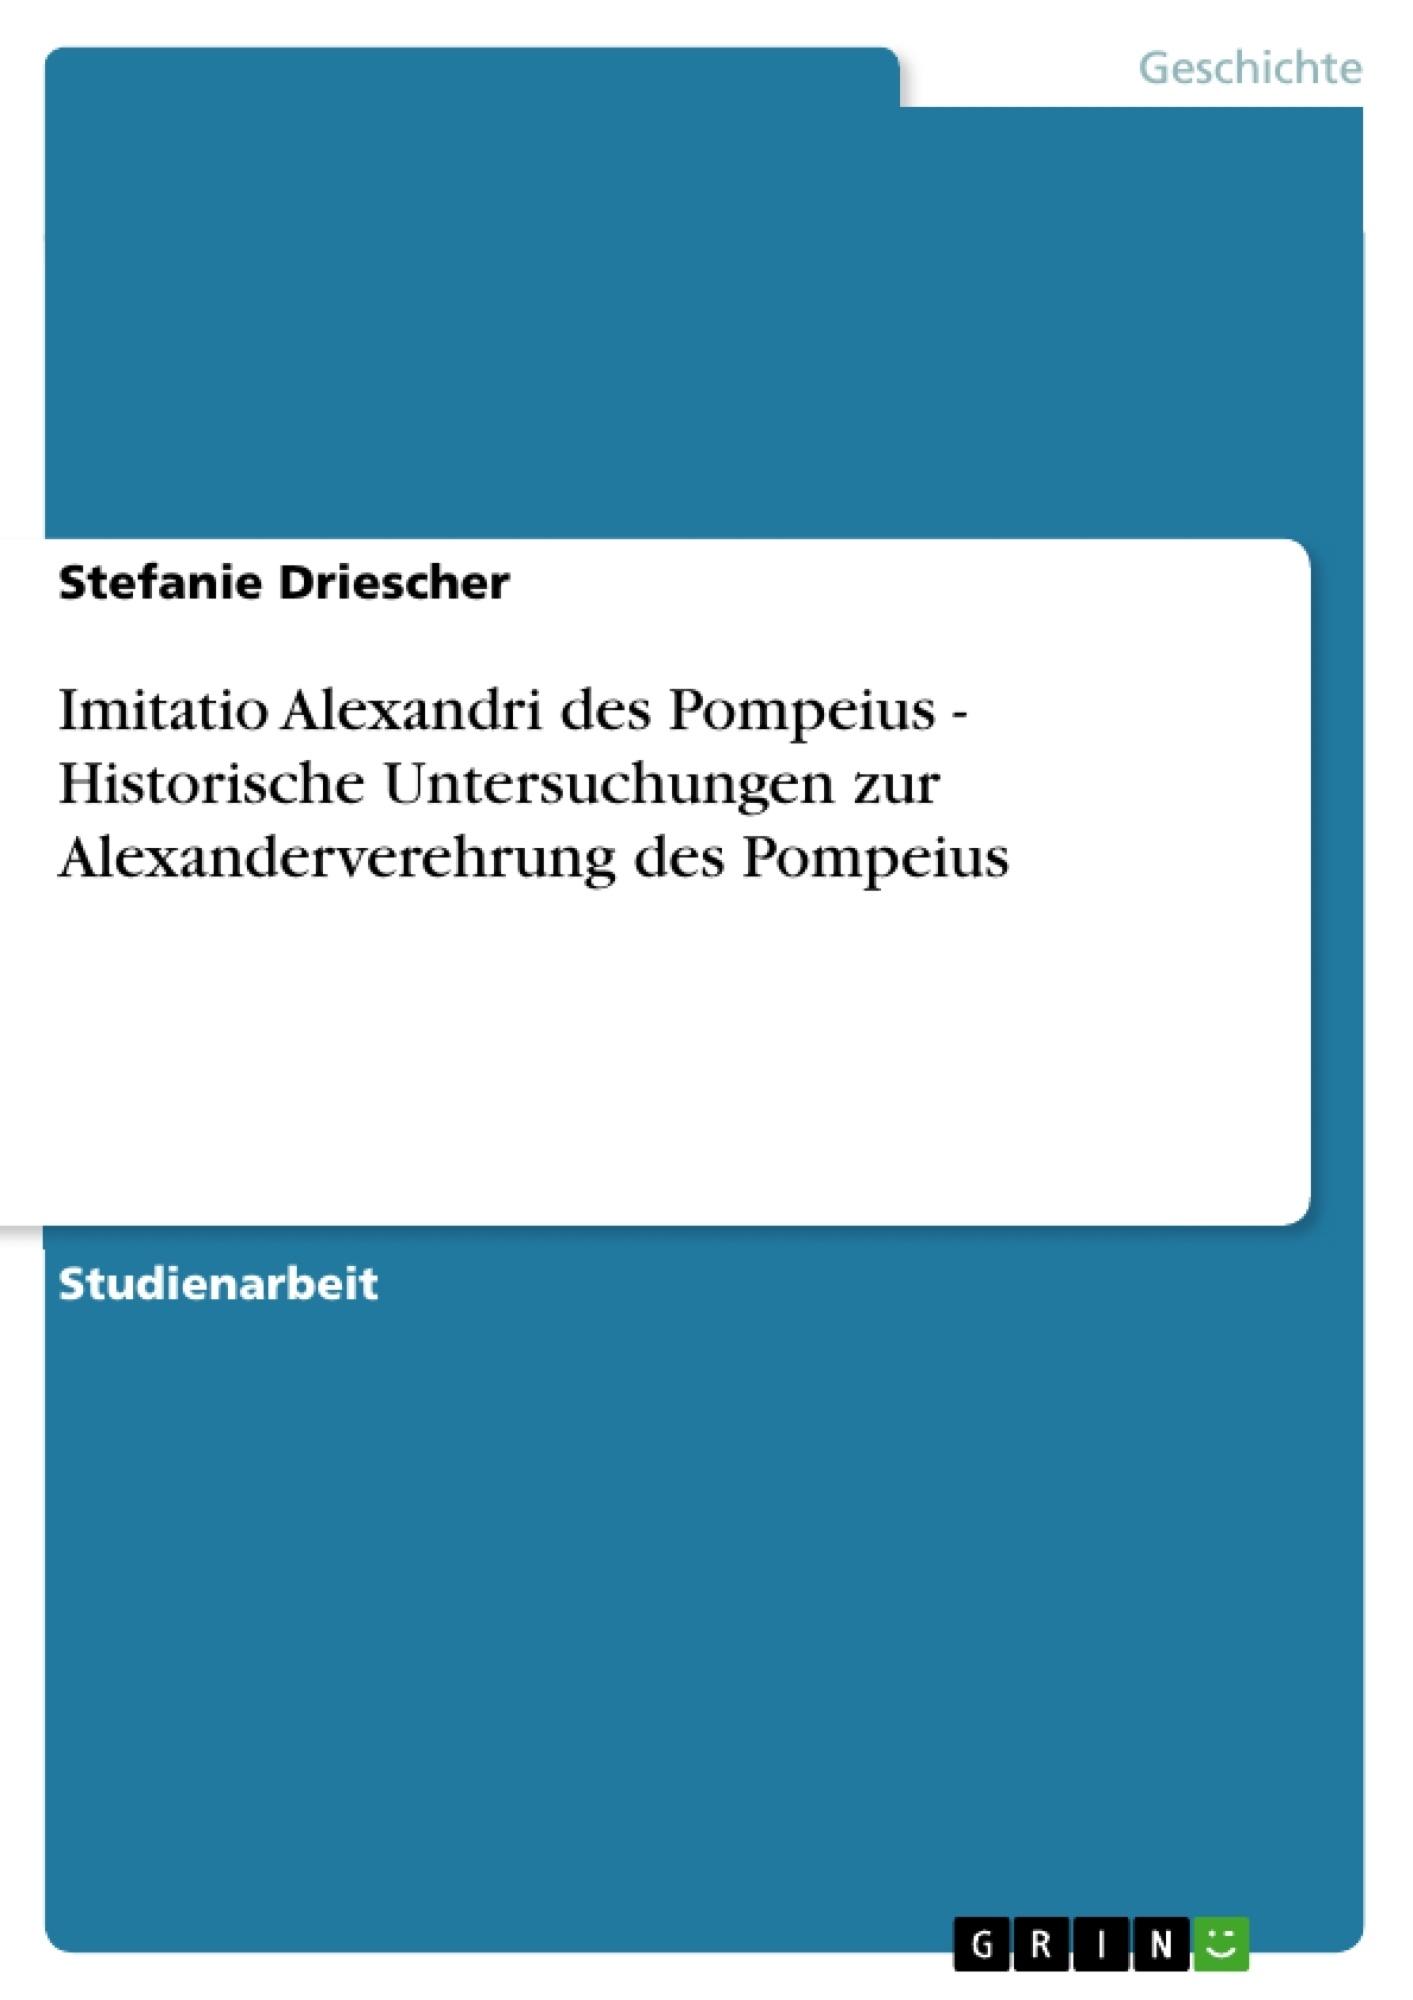 Titel: Imitatio Alexandri des Pompeius - Historische Untersuchungen zur Alexanderverehrung des Pompeius